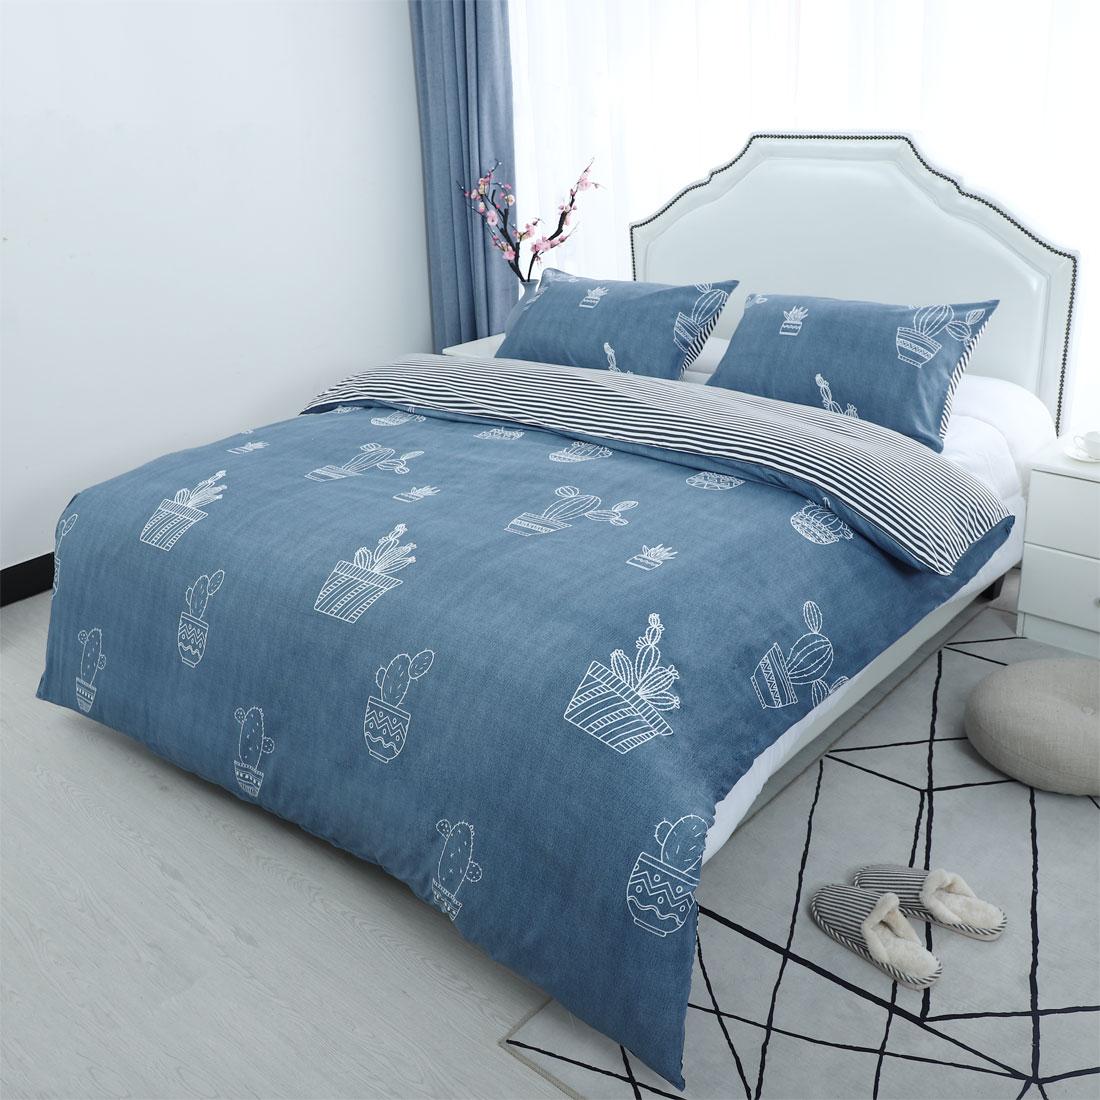 Floral-Bedding-Set-Duvet-Cover-Set-Comforter-Cover-Single-Full-Queen-King-4-Size thumbnail 16